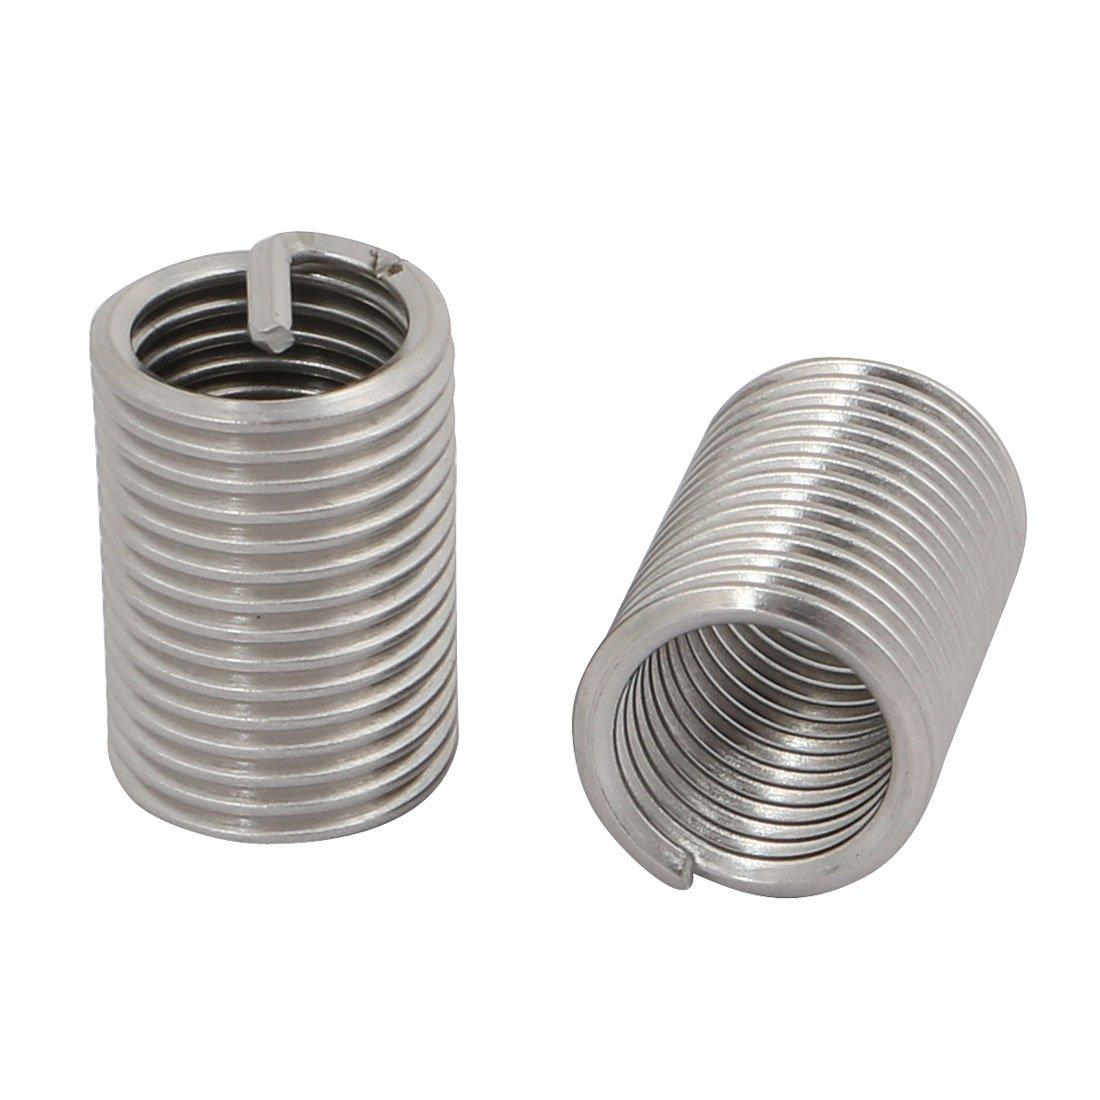 Sourcingmap 10Pcs M14 Inner Thread 35mm Installed Length Stainless Steel Helical Coil Insert